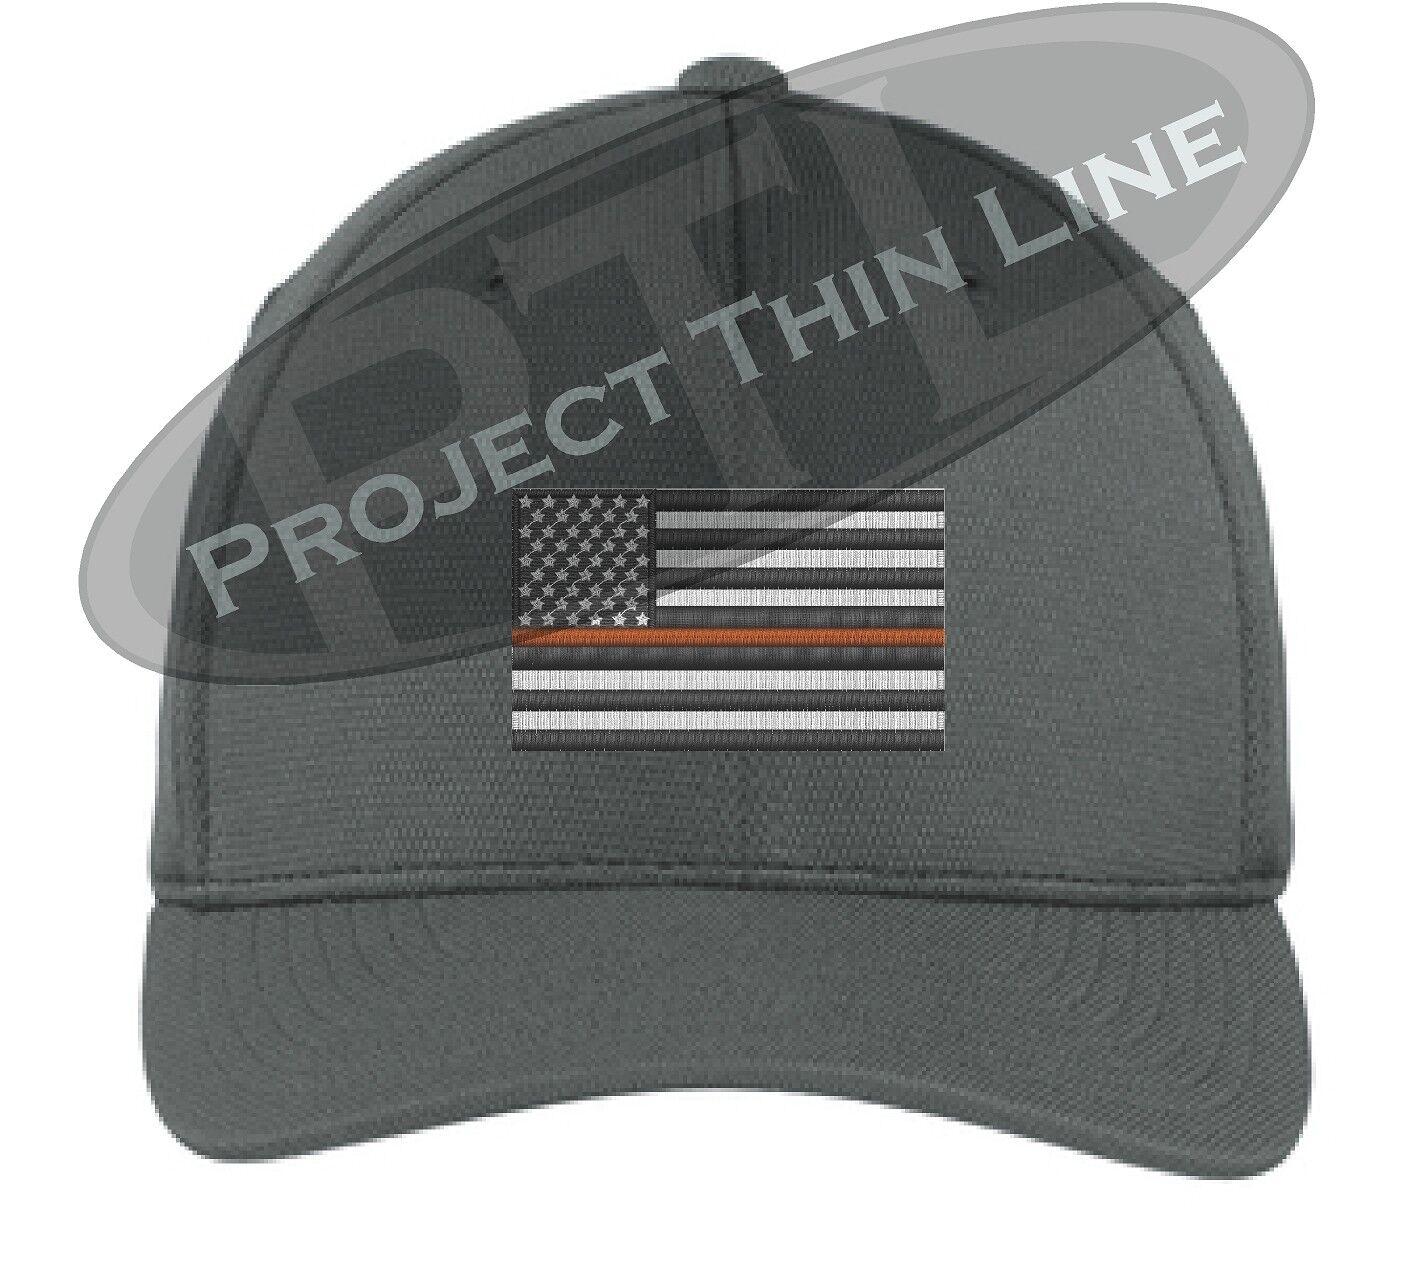 2a98cf855b544 order thin orange rescue line american flag search rescue orange coast  guard flex fit trucker hat